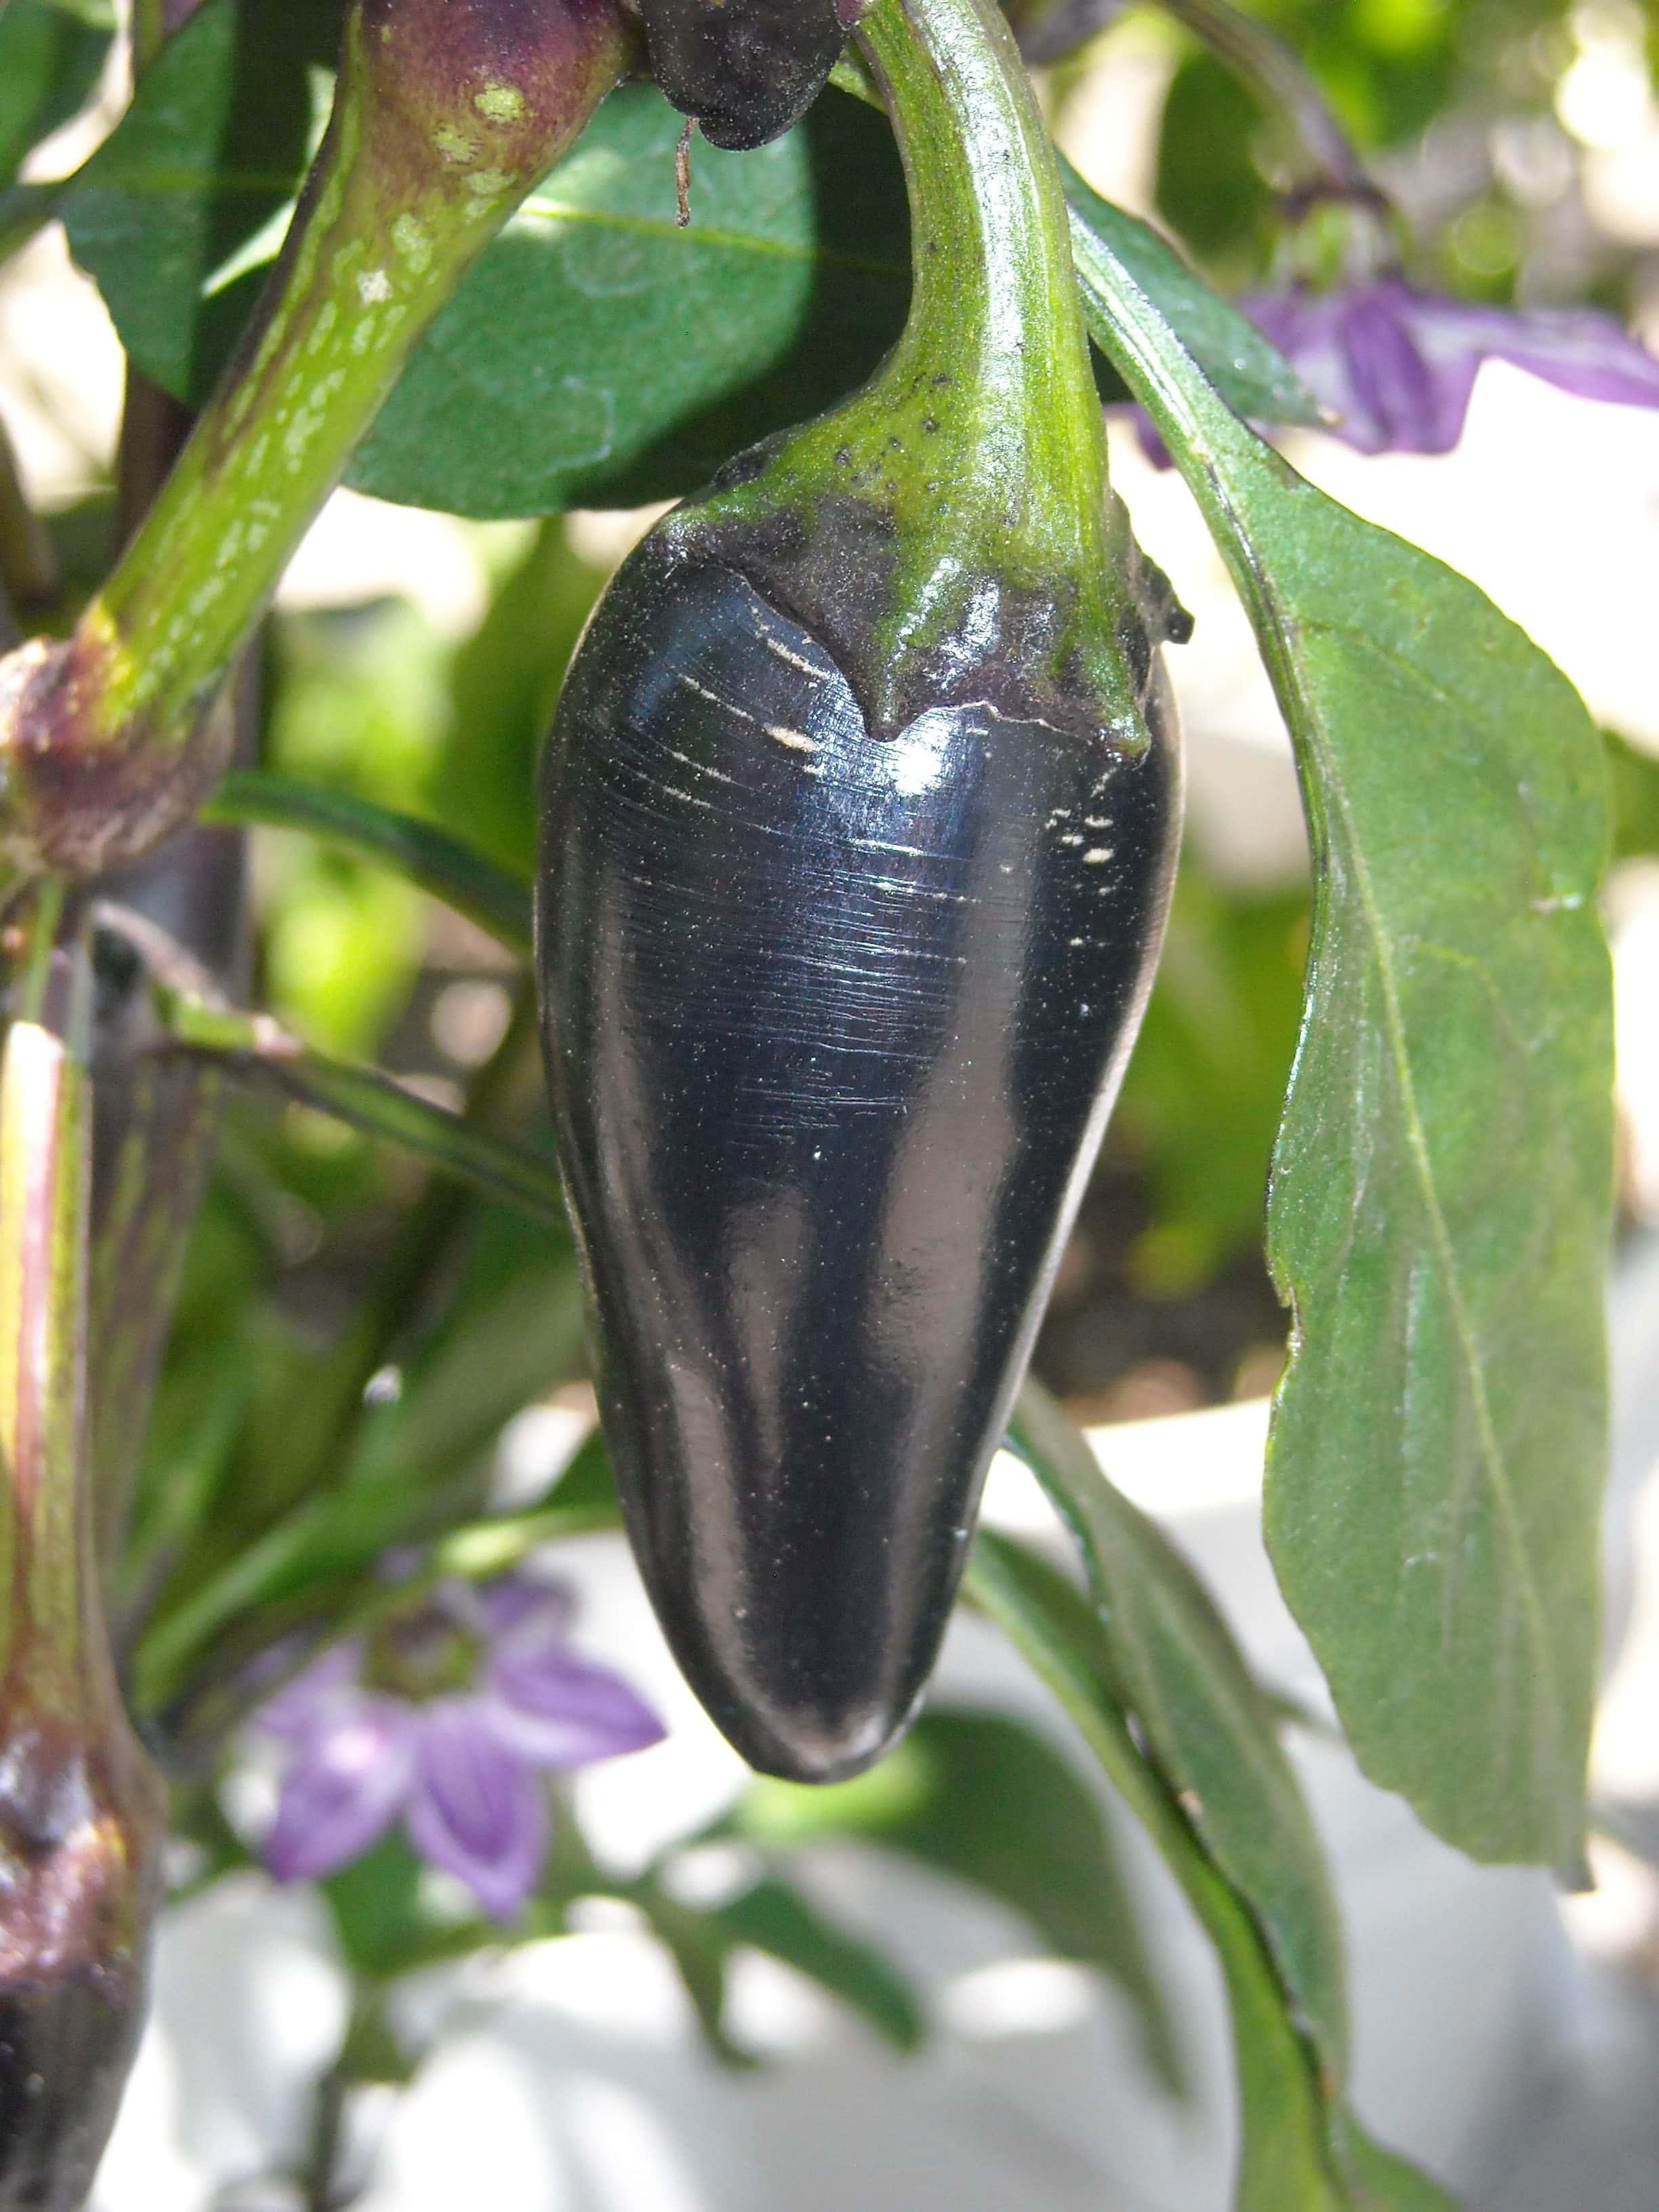 purple jalapeno pepper growing on the vine